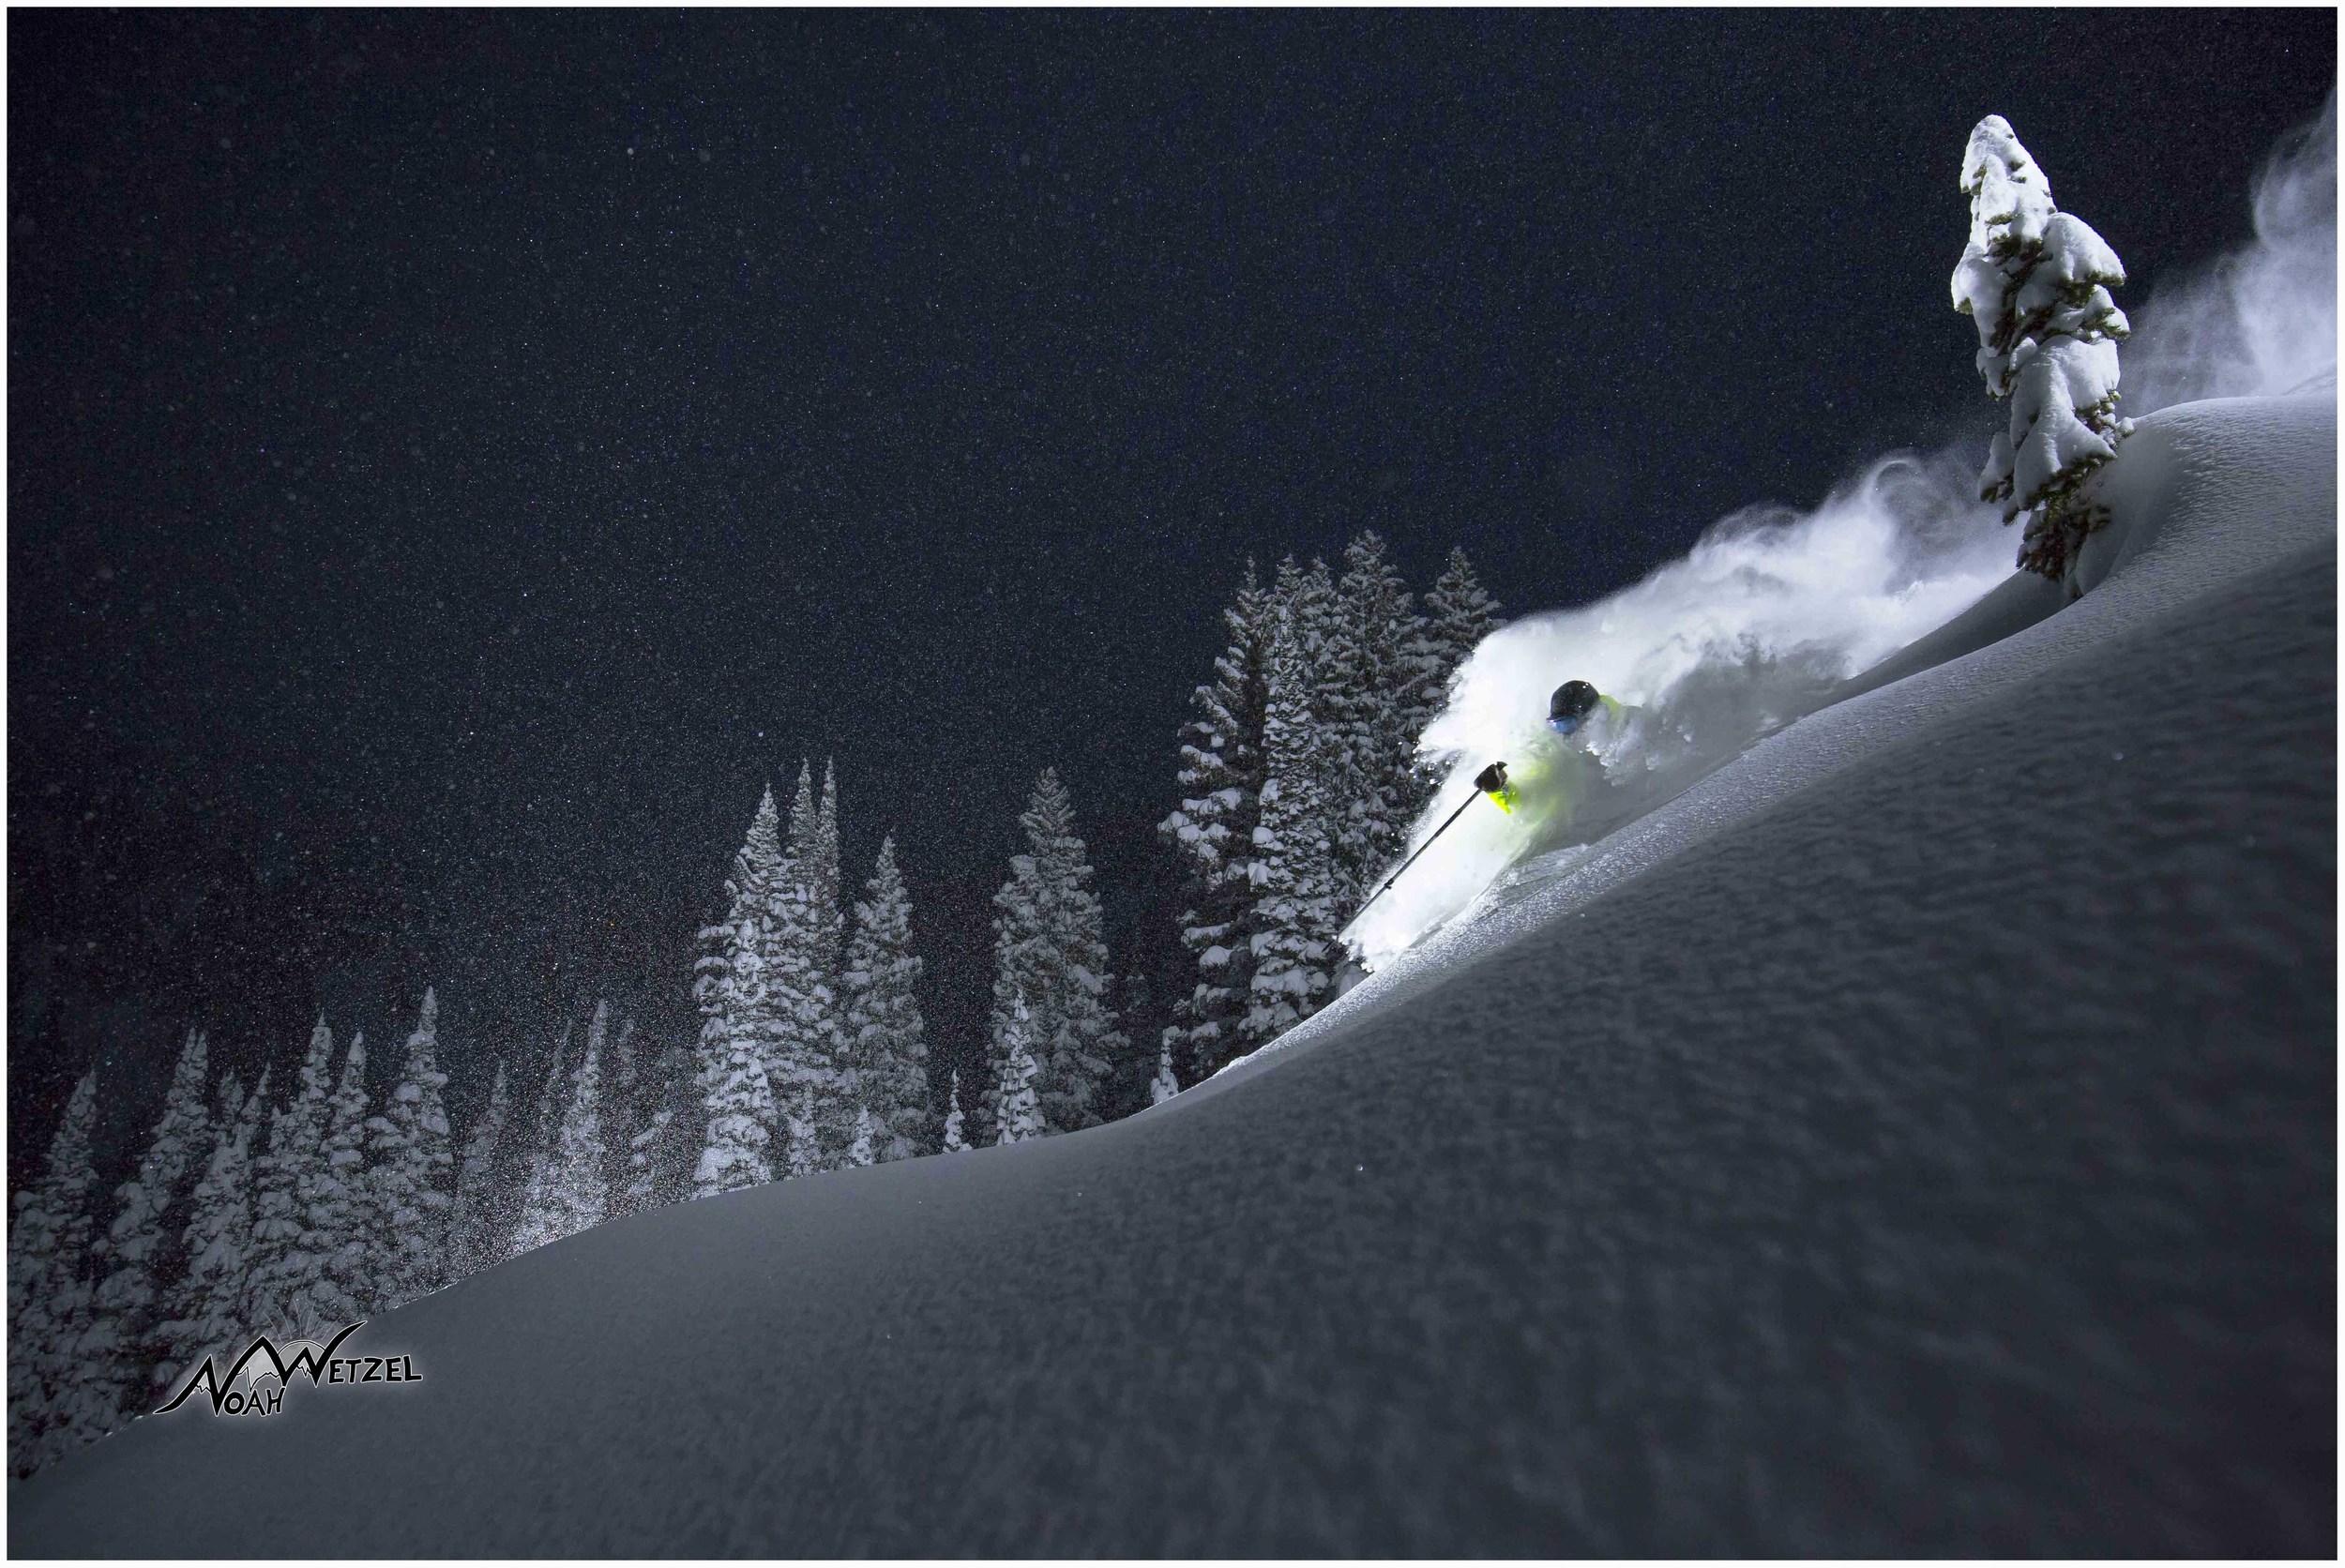 Willie Nelson rips a few turns in a winter wonderland in Alta, Utah.